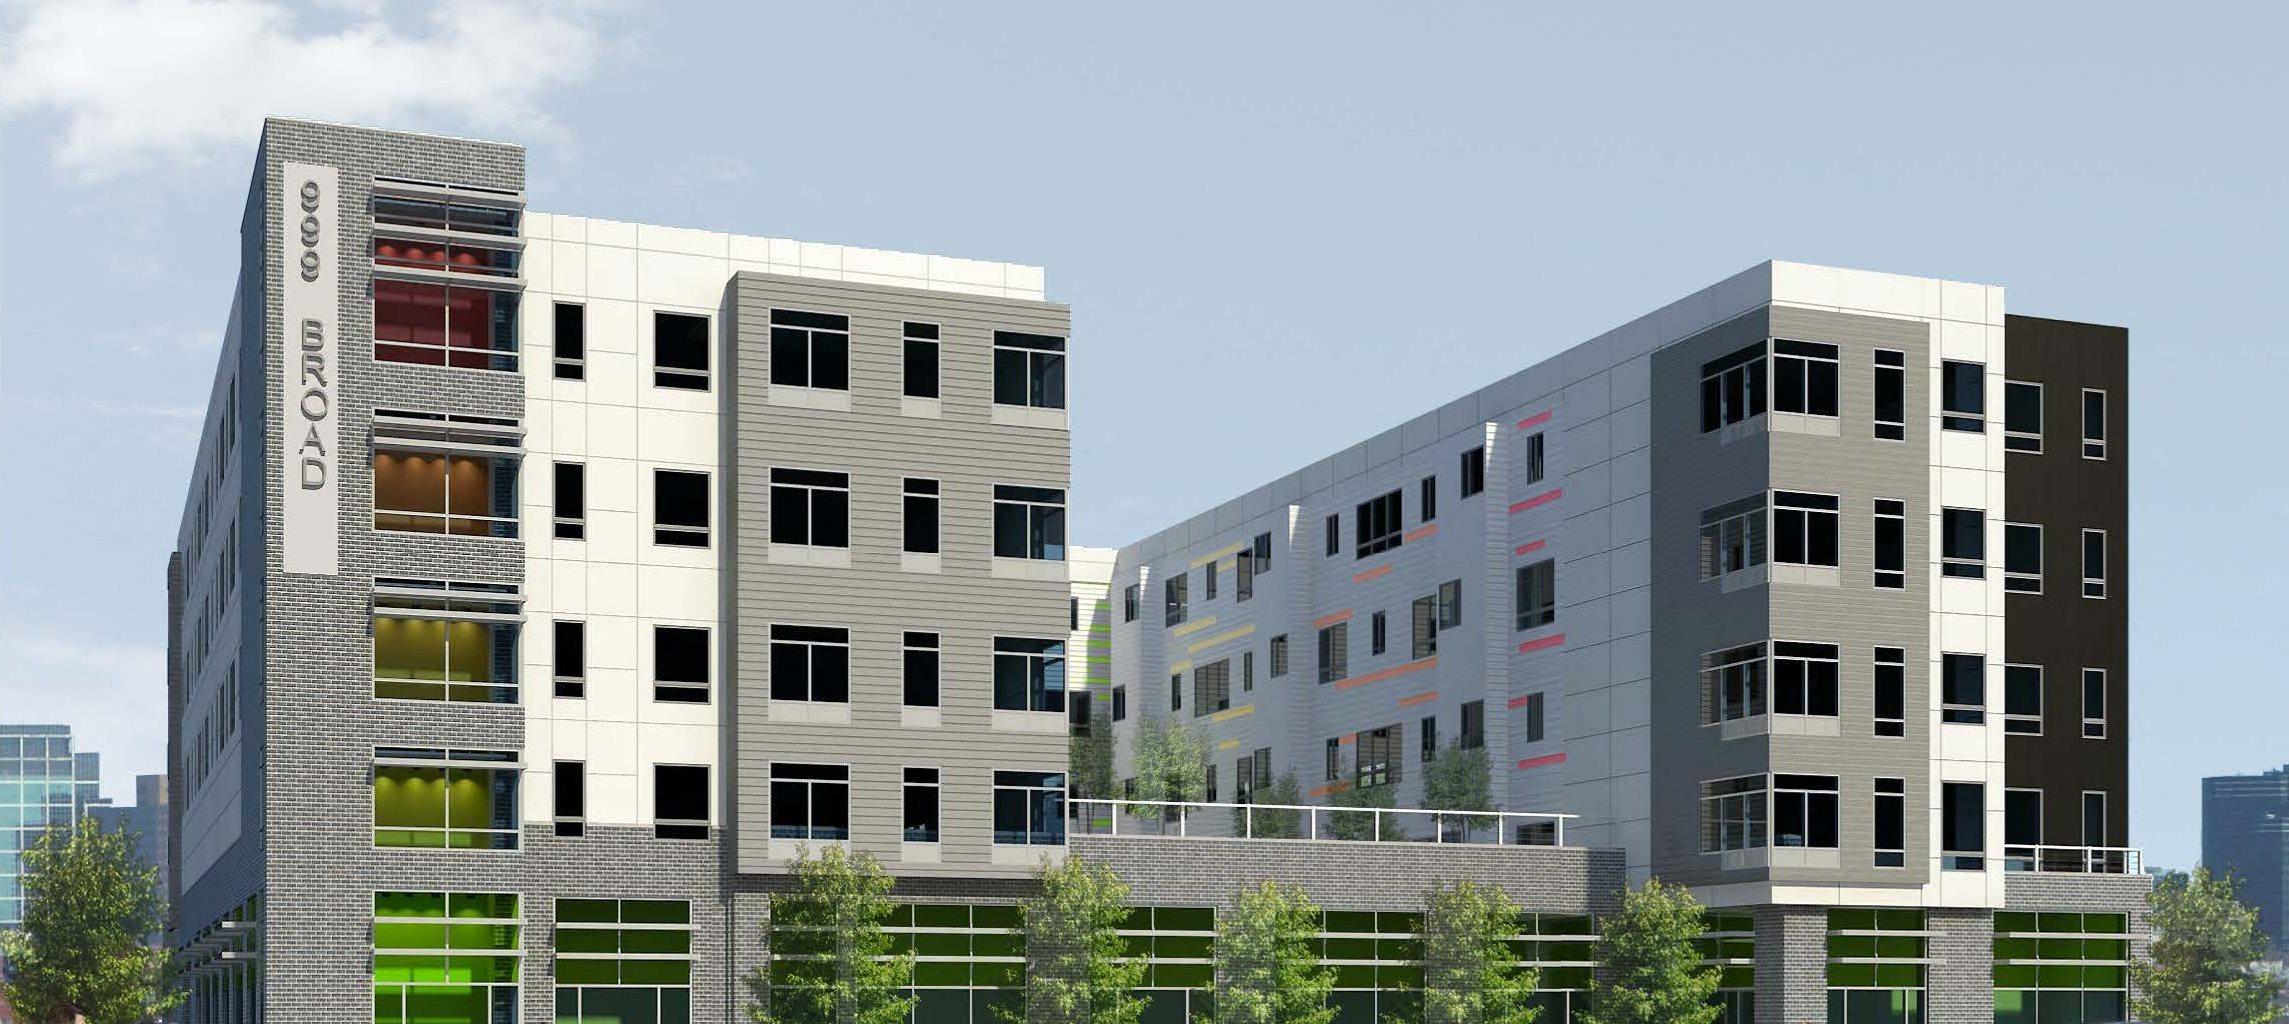 final broad apartments homepagegallery bedroom nj elizabeth rent for newark in